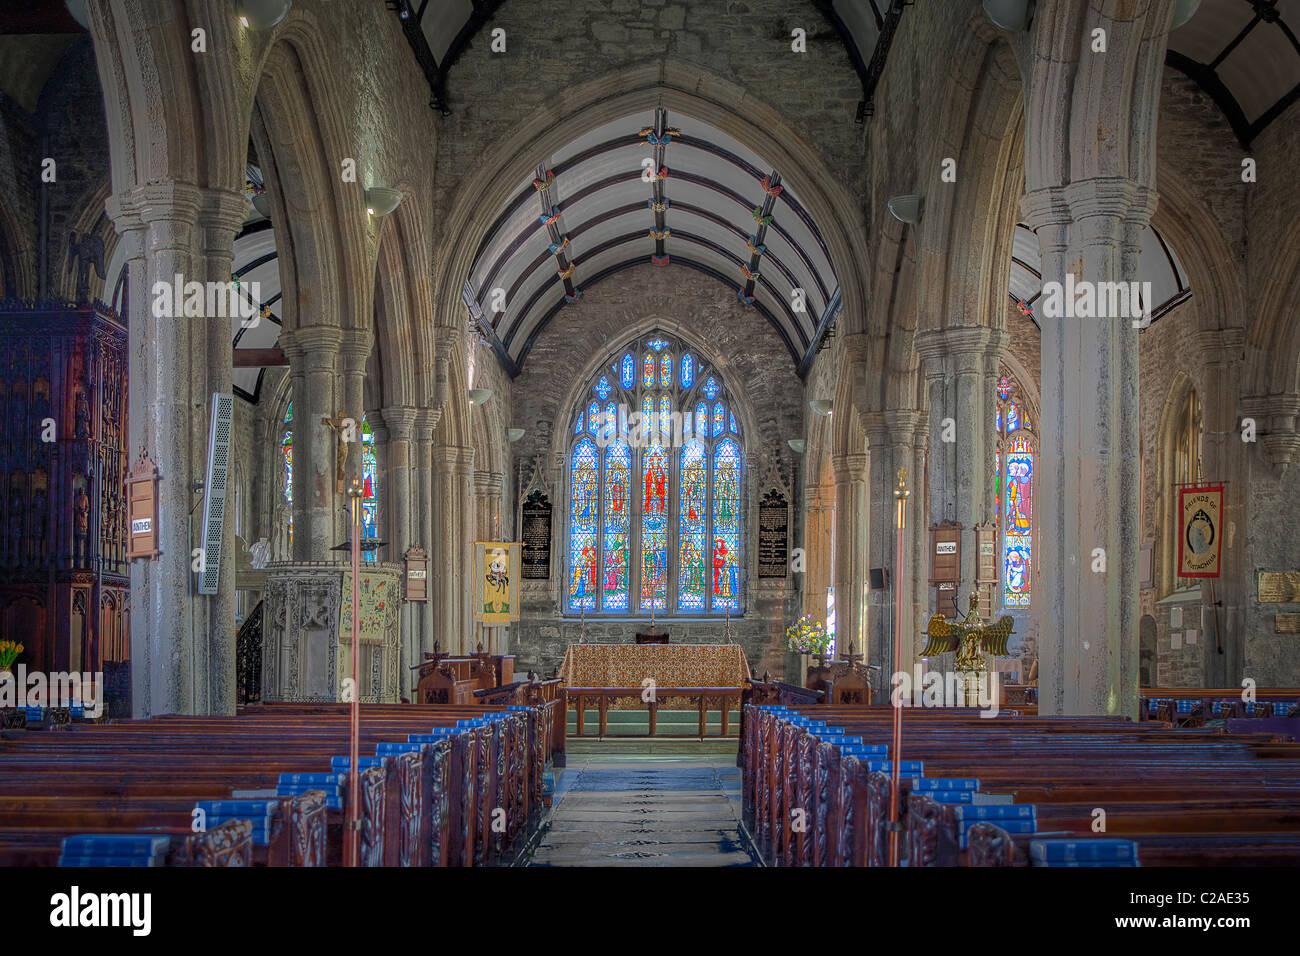 An internal image of St Eustachius' Parish Church in Tavistock. An exposure blend of 5 images. - Stock Image